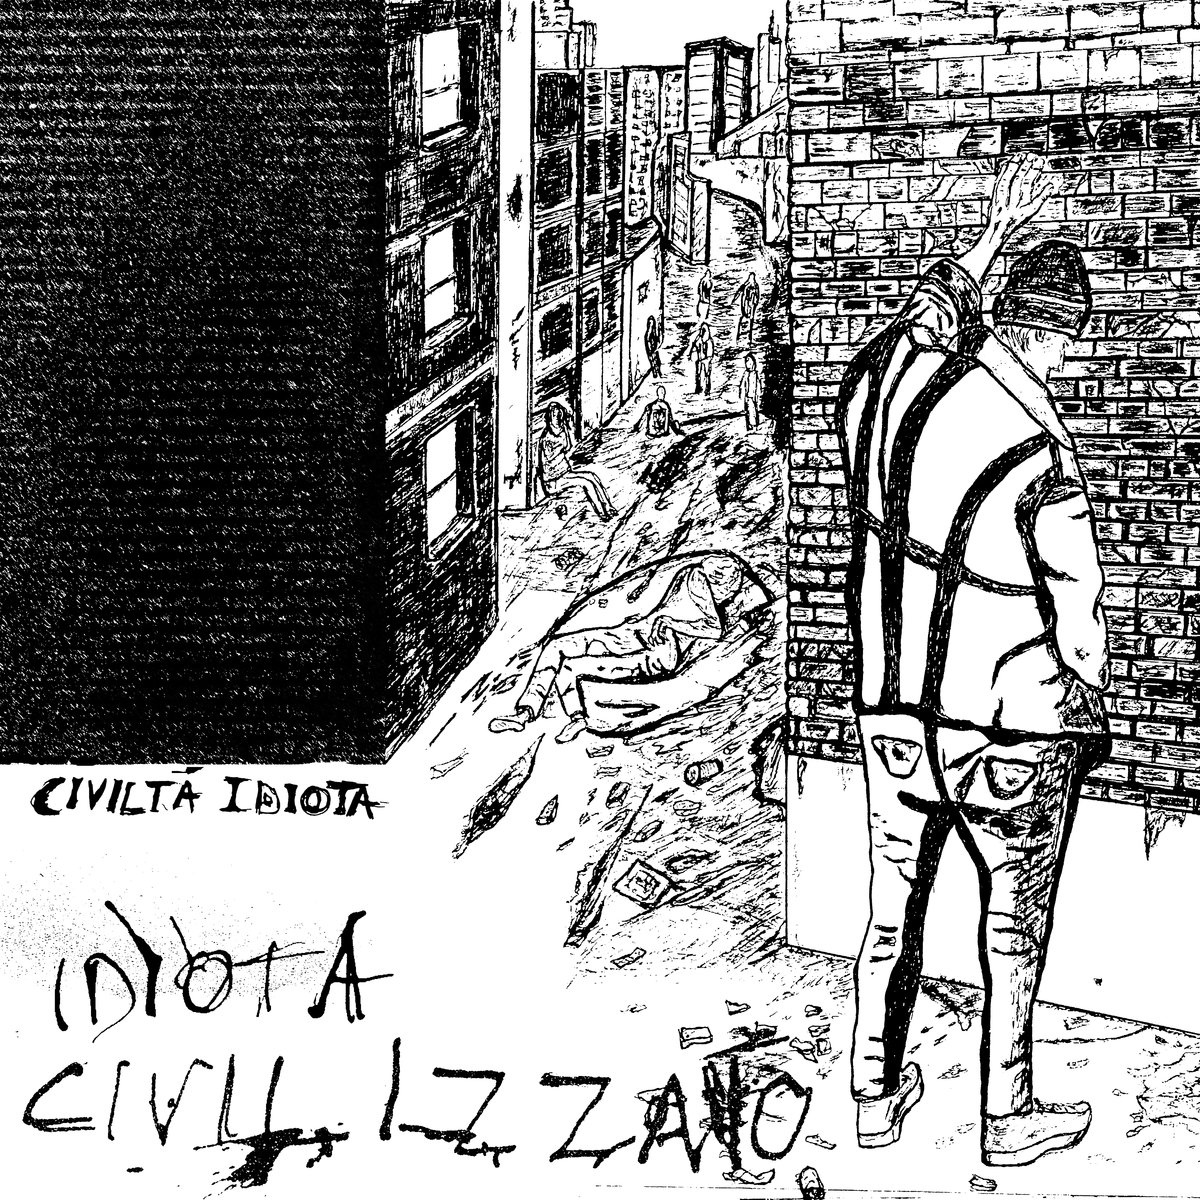 Idiota Civilizzato - Civilta Idiota 7